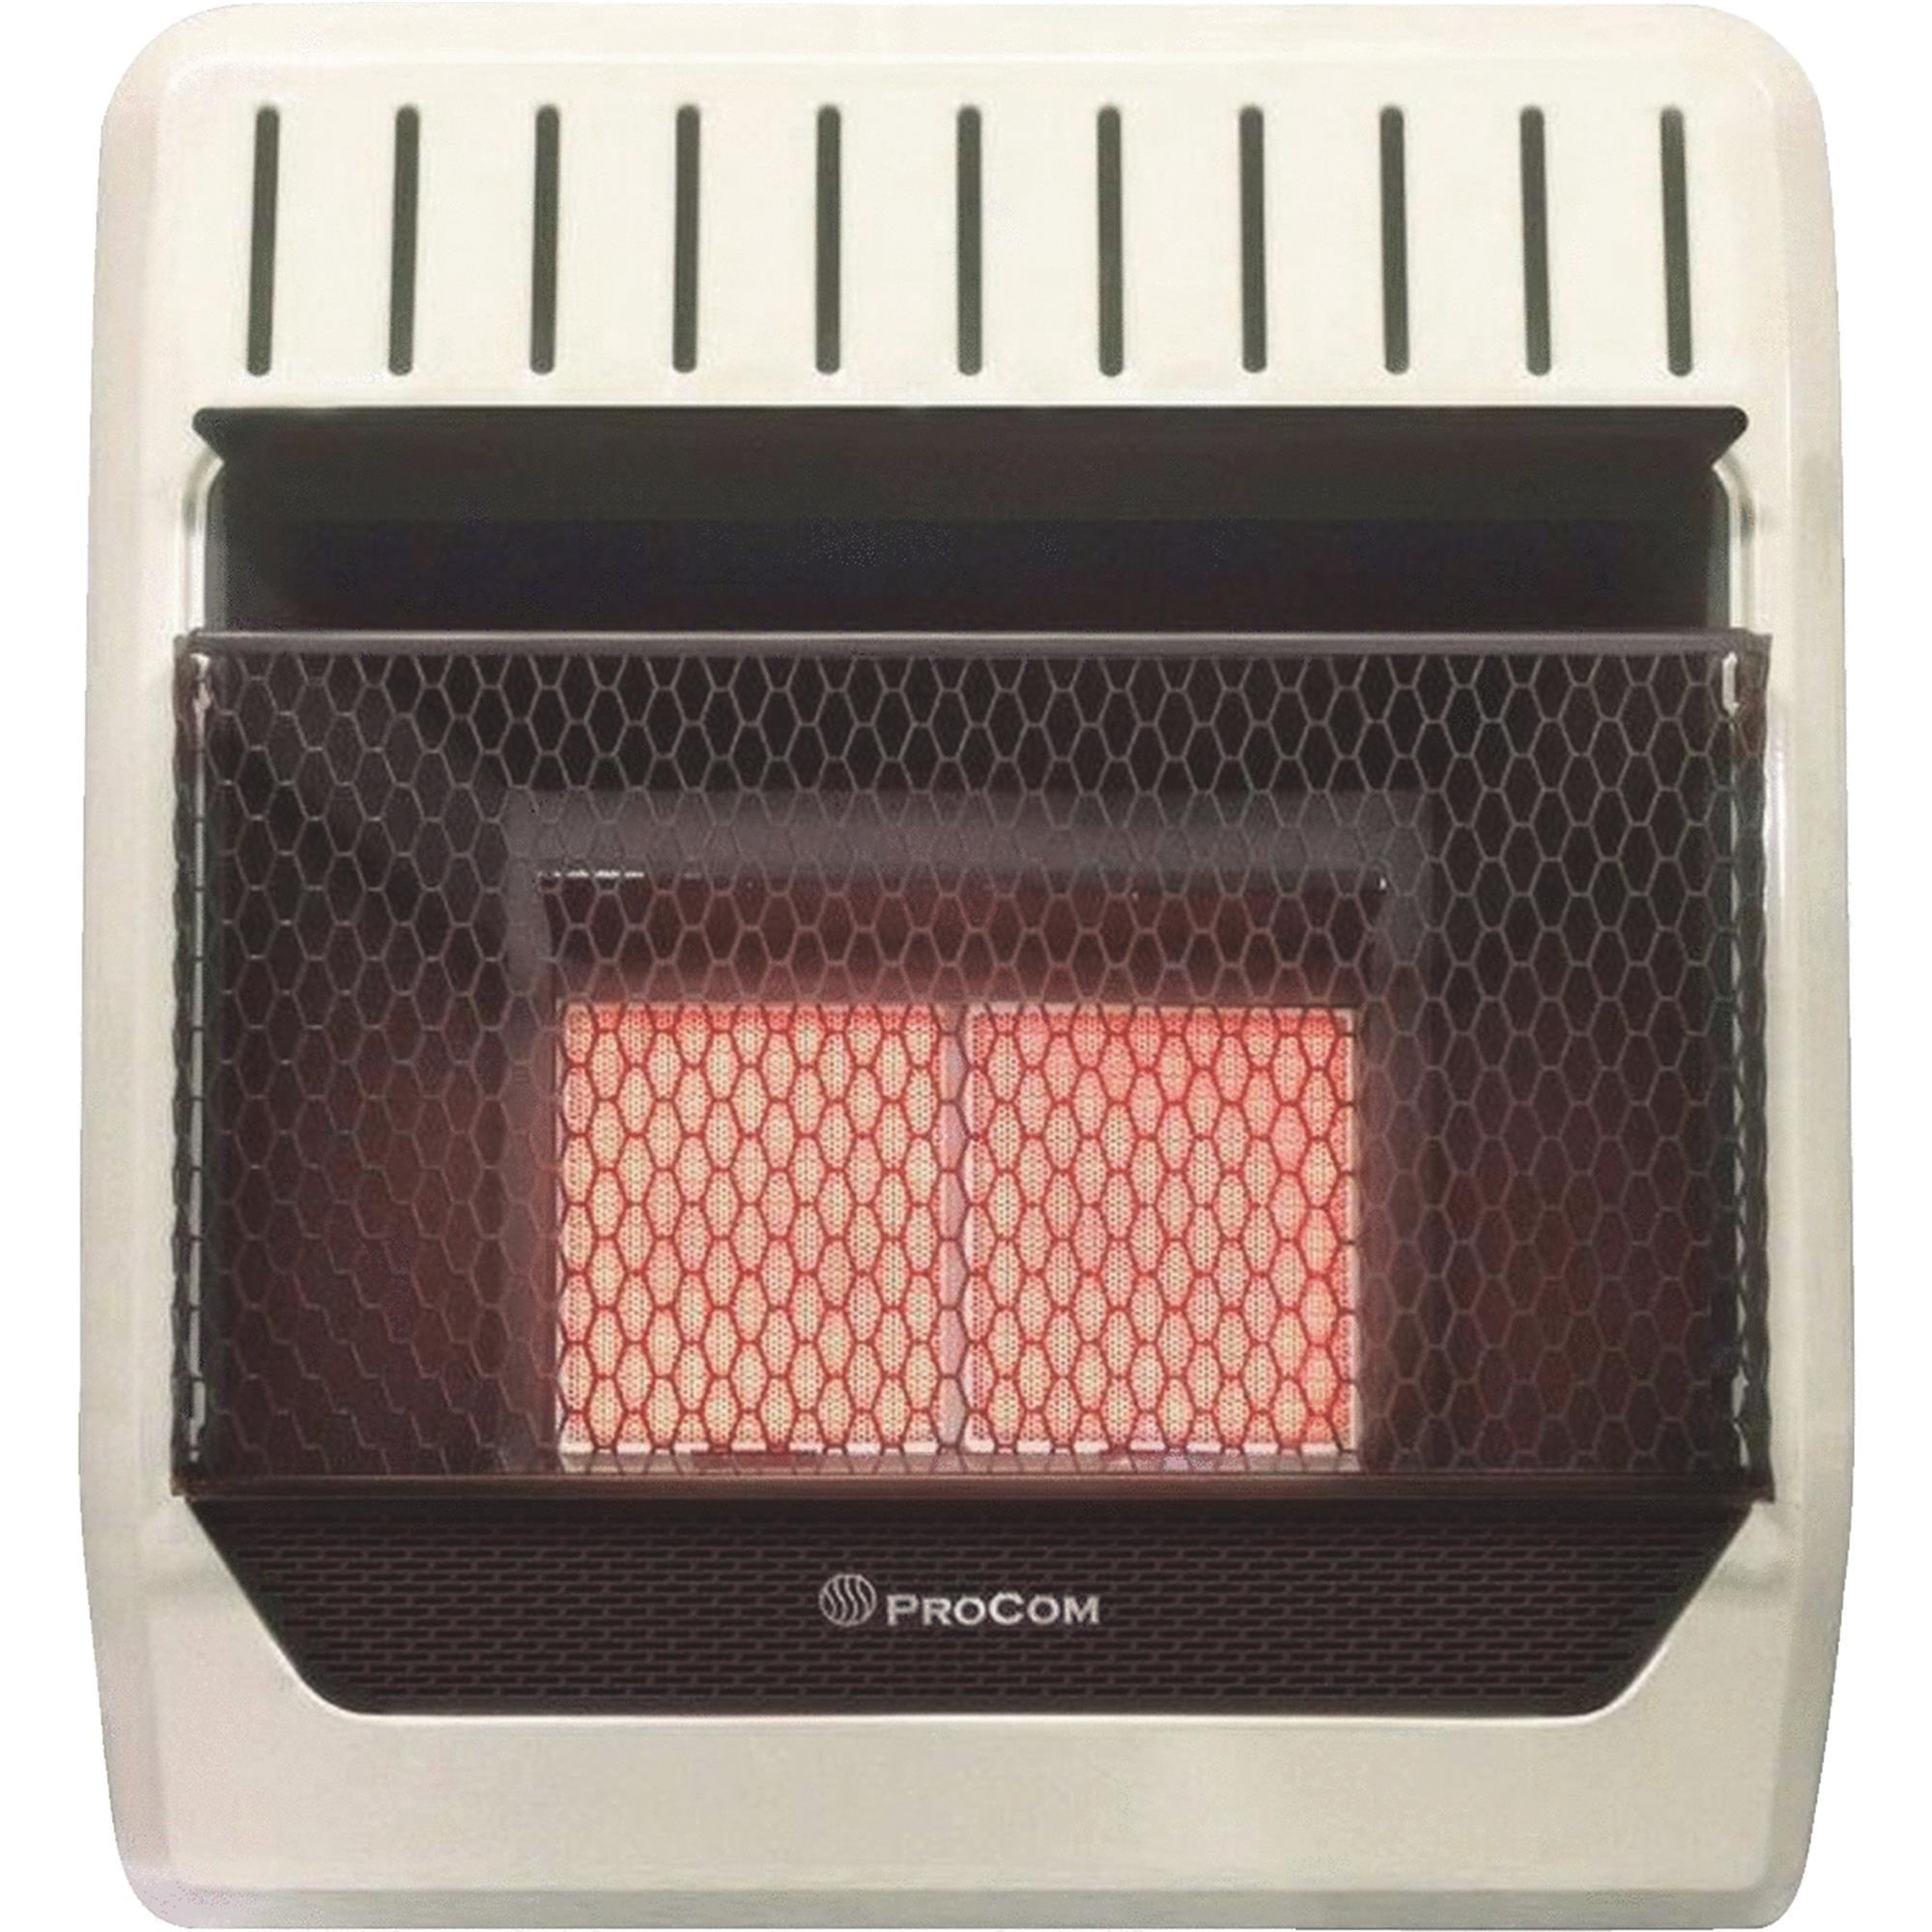 ProCom Infrared Gas Wall Heater by Procom